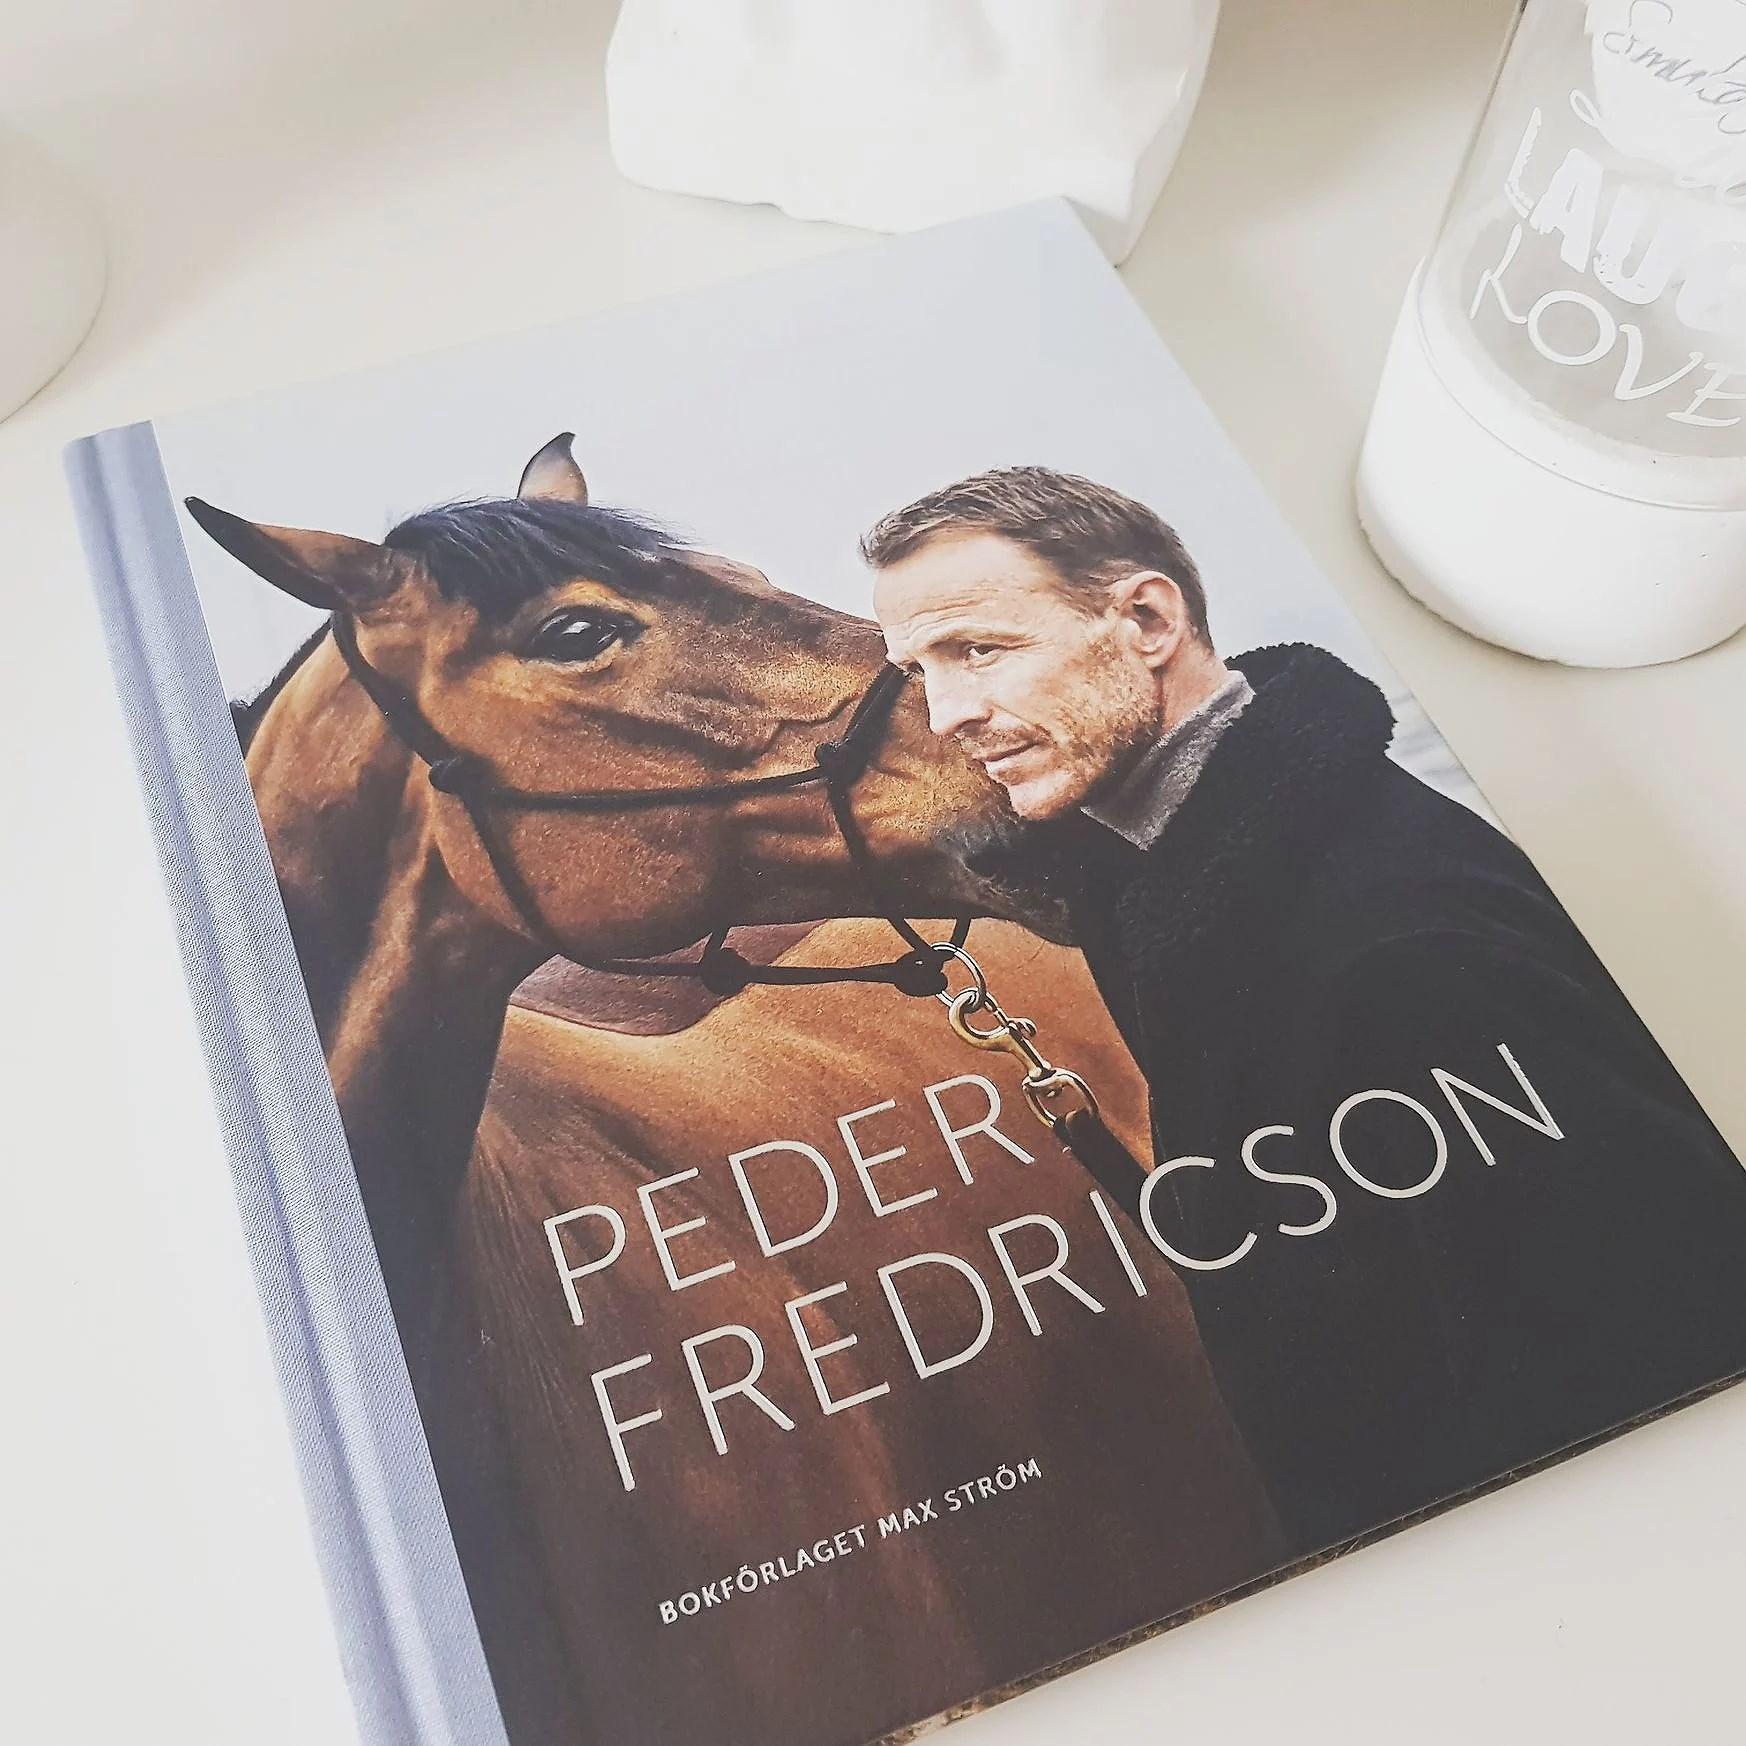 Tack Peder Fredricson & Bokförlaget Max Ström!